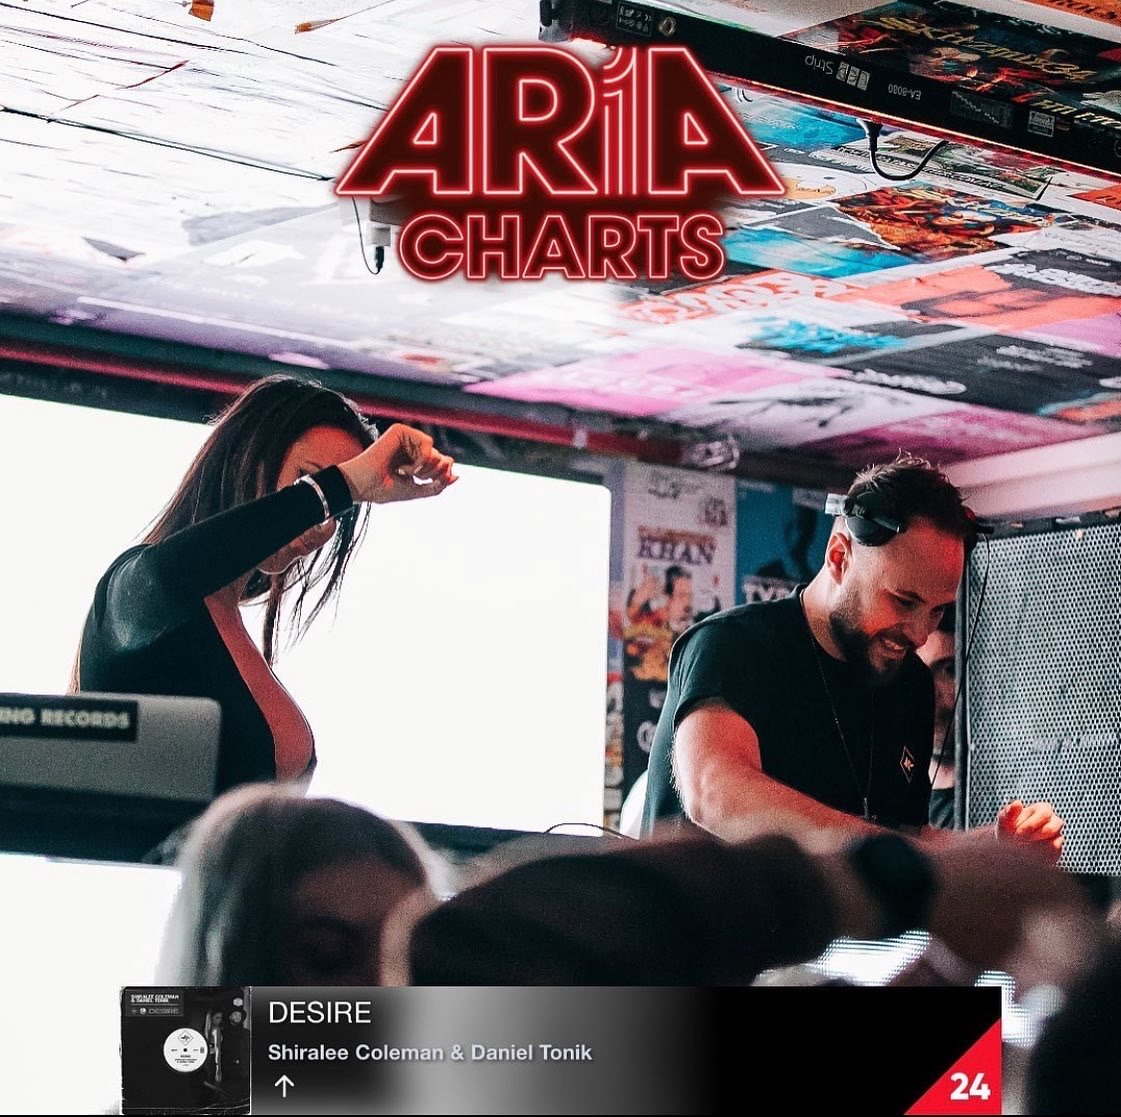 [Chart] Shiralee Coleman, Daniel Tonik, Desire #24 Aria Club Chart Shiralee Coleman, Daniel Tonik, Desire, Aria Club Chart, Pumping Records